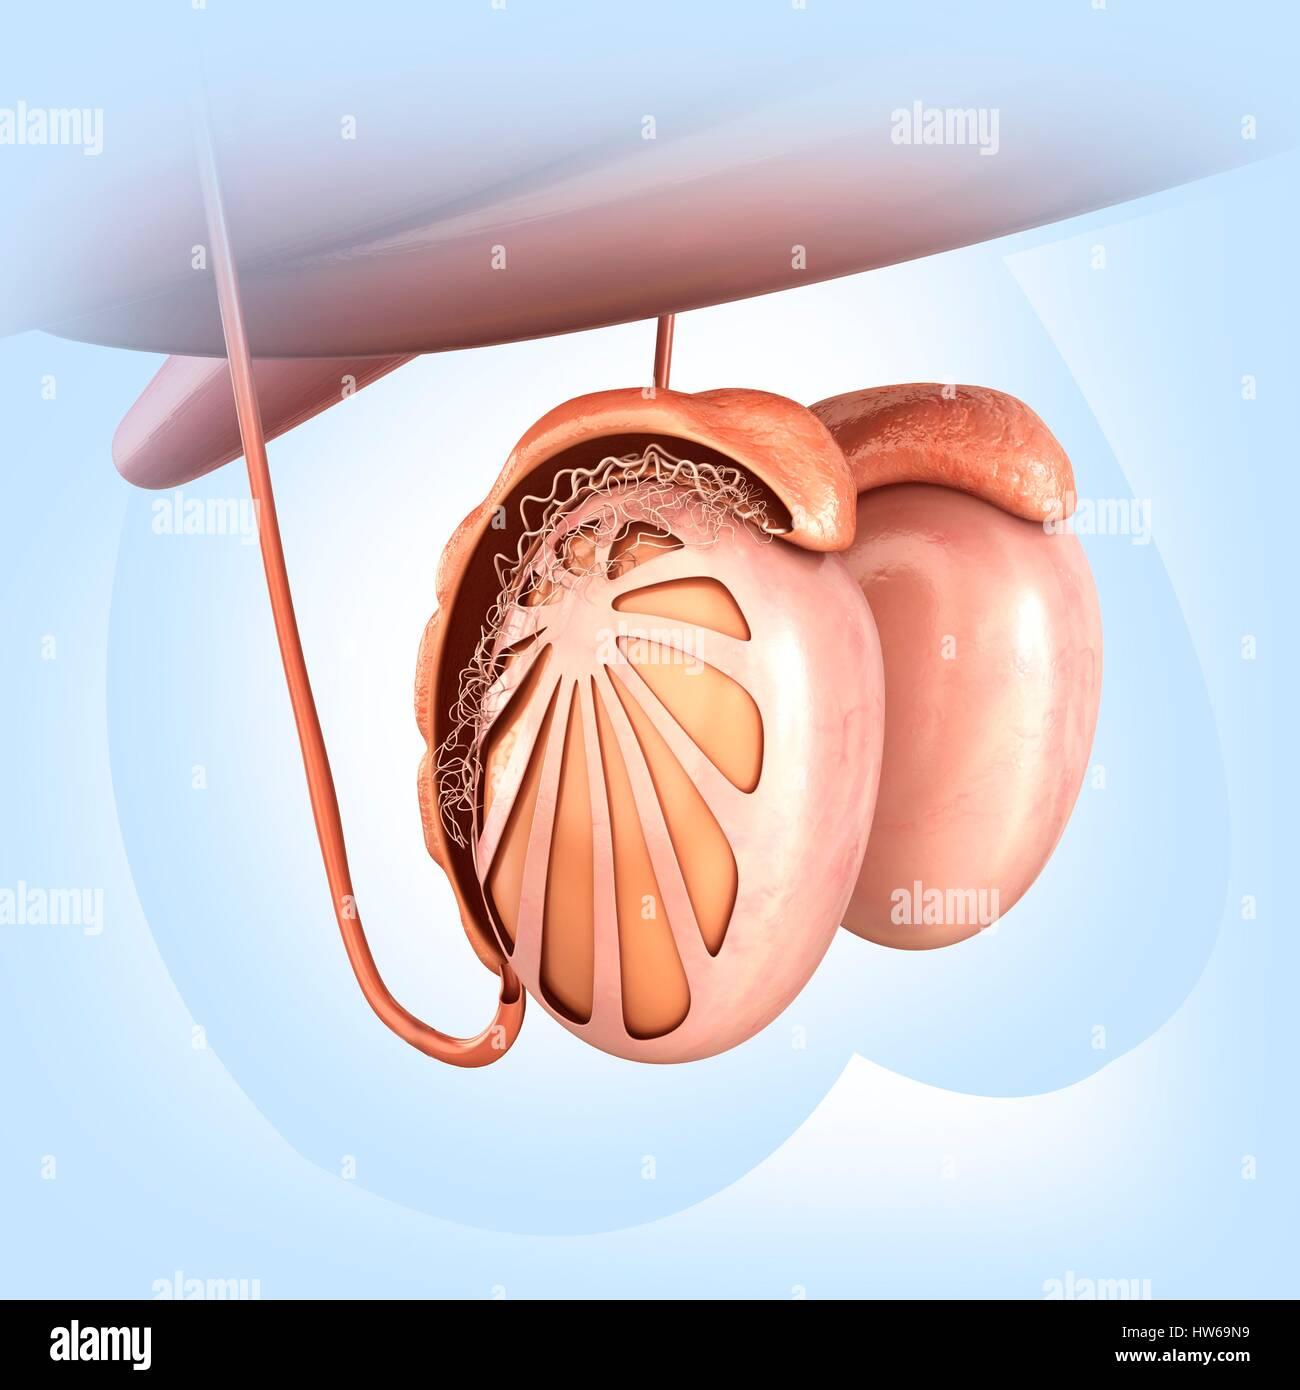 Illustration of male testes anatomy Stock Photo: 135978341 - Alamy